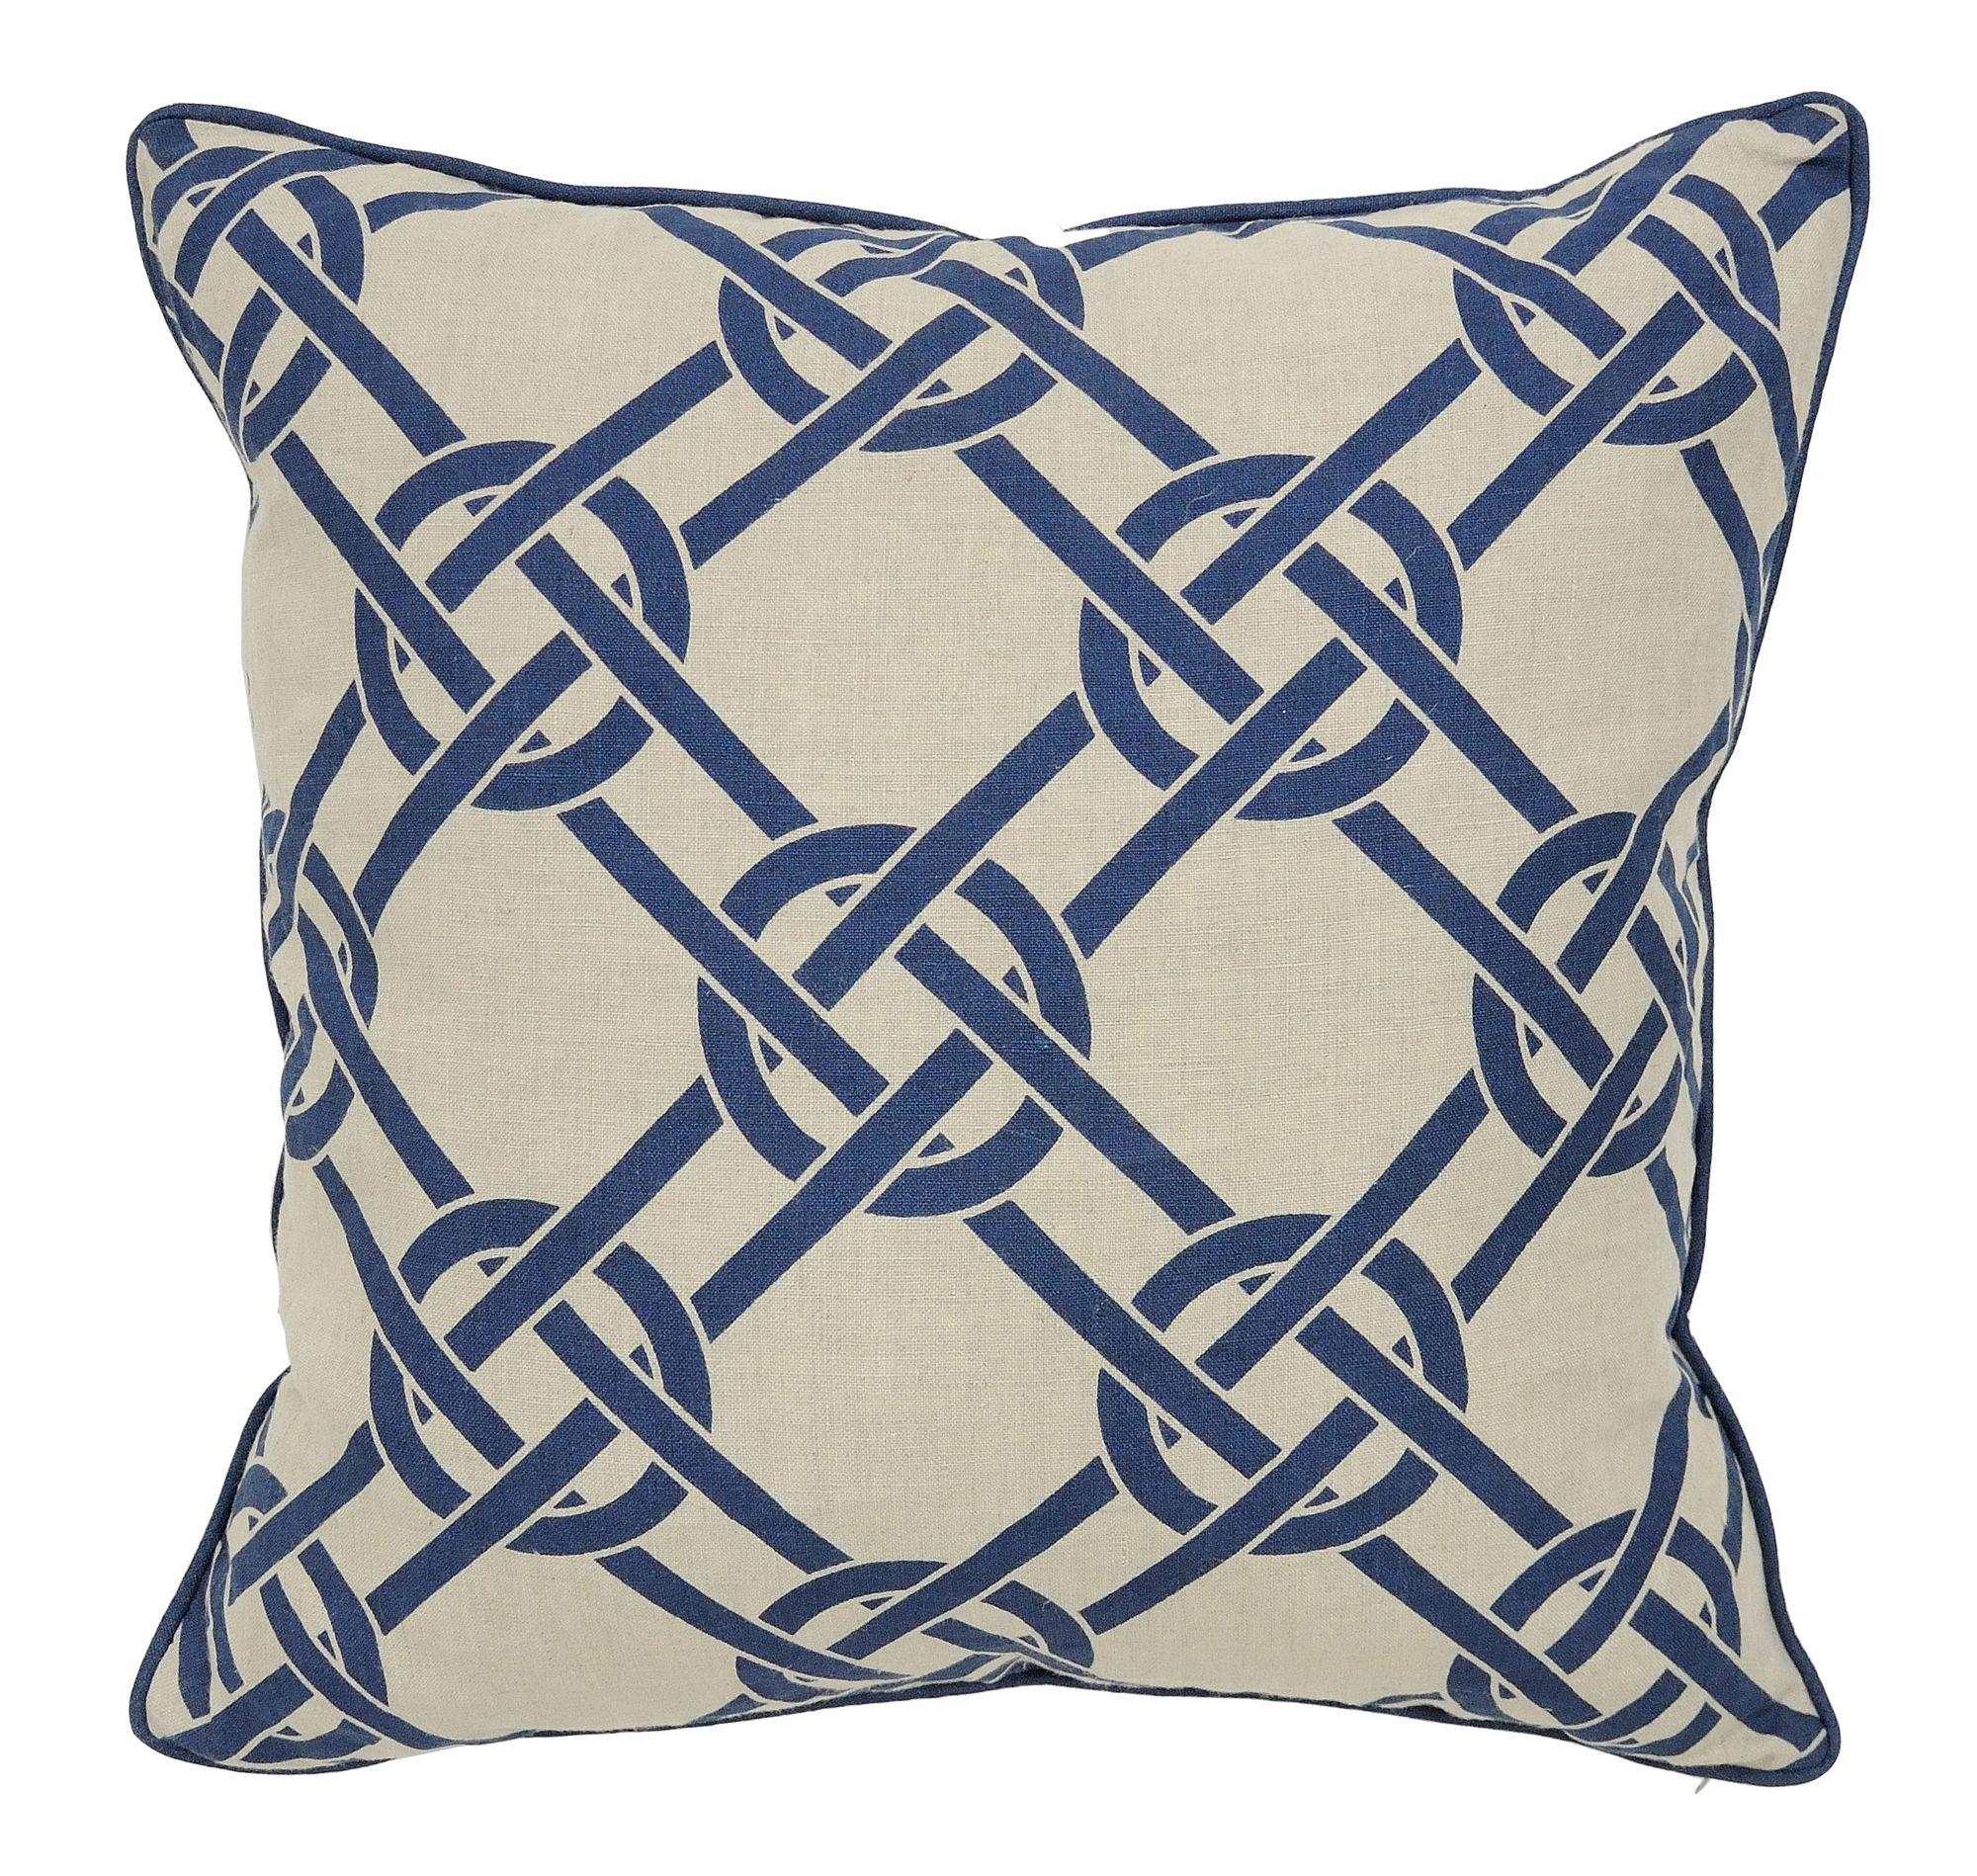 Villa Home Seafarer Linen/ Cotton Catalina Accent Pillow